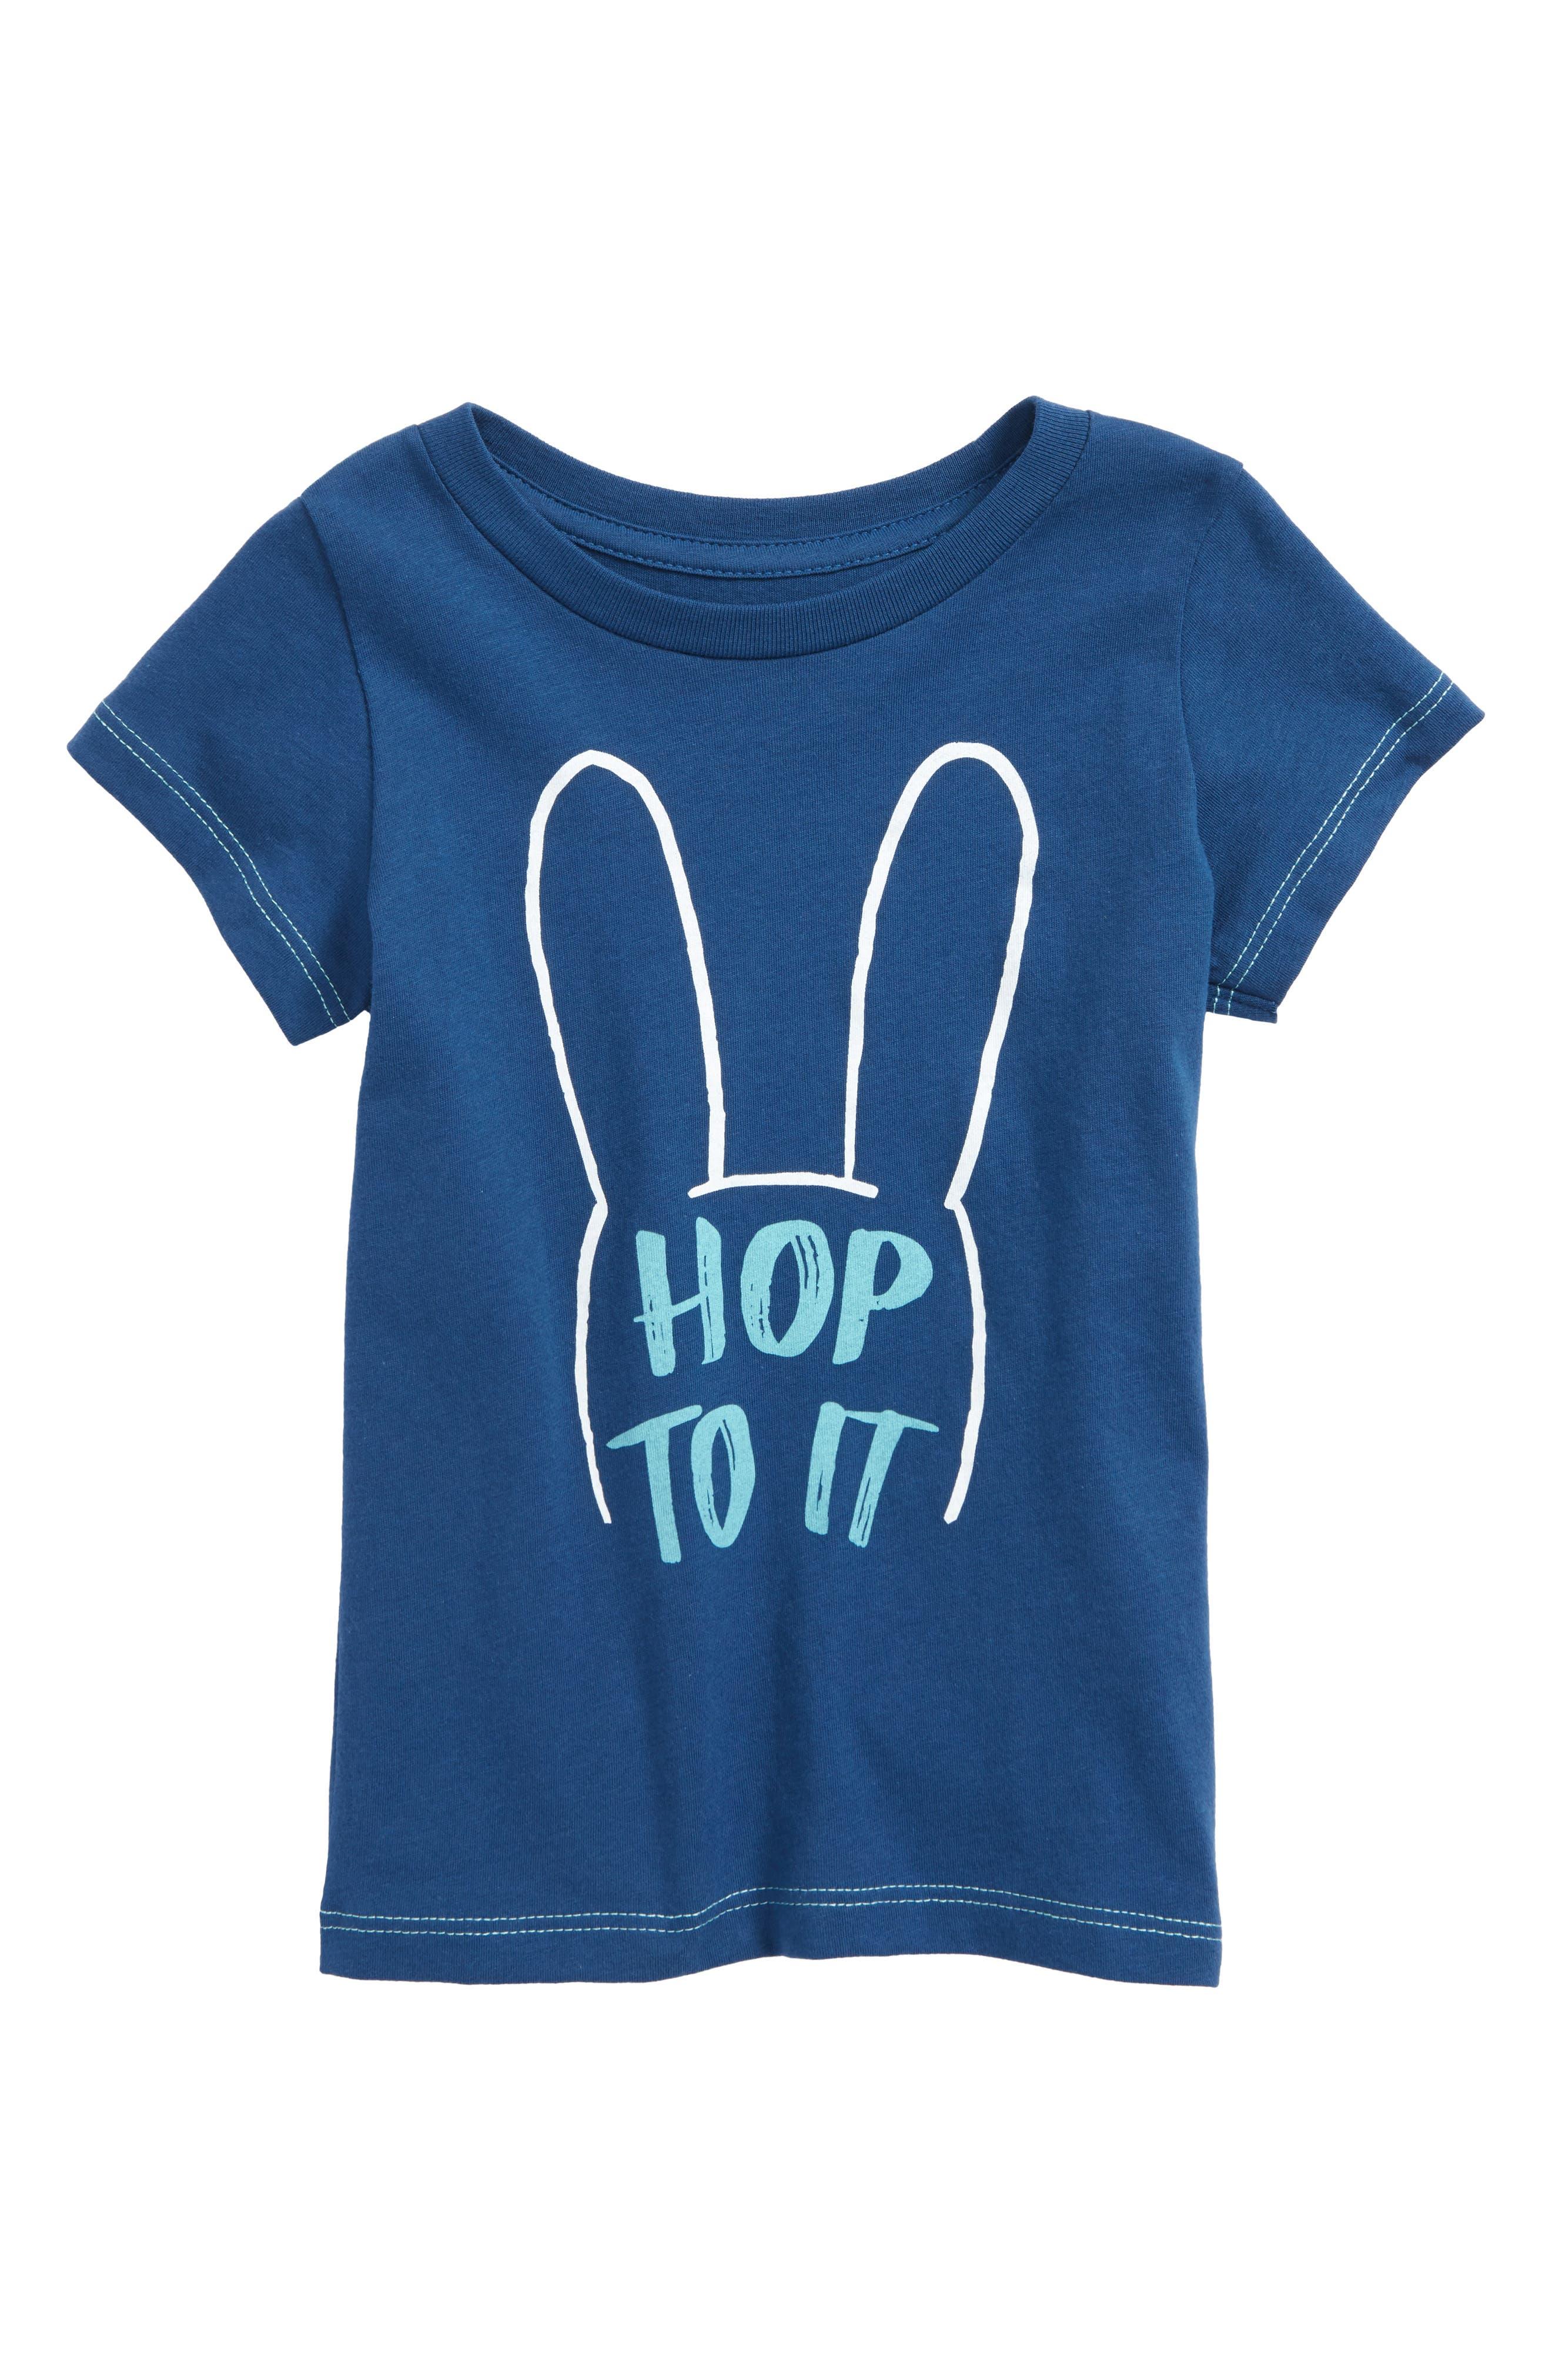 Peek Hop To It Graphic T-Shirt,                         Main,                         color, 440